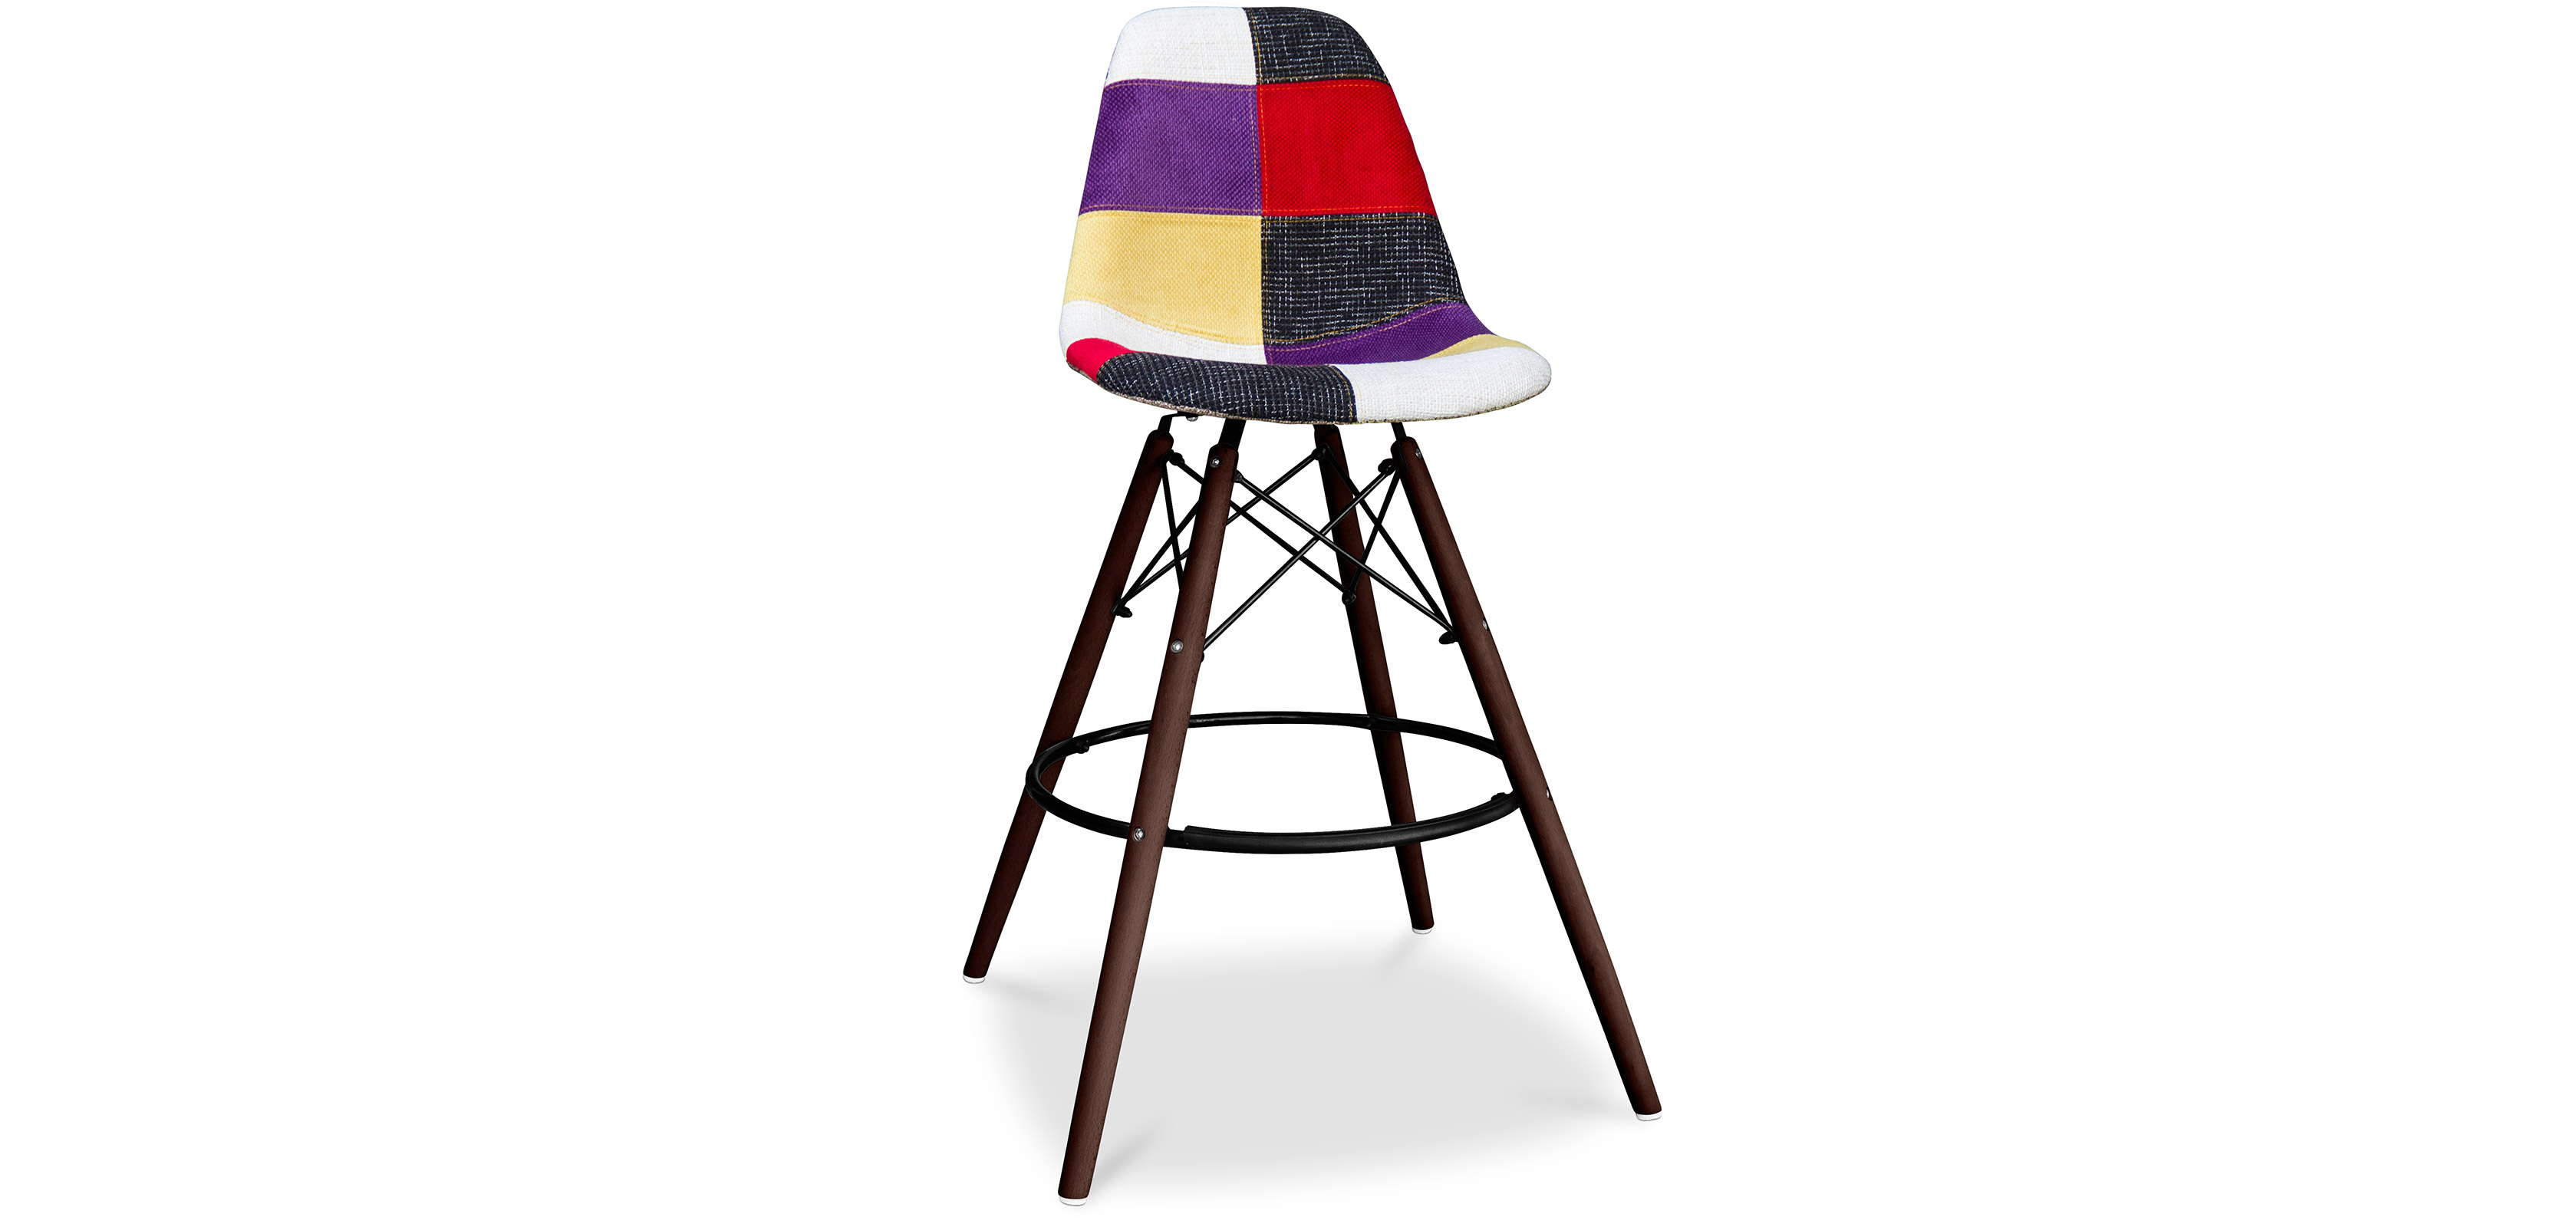 tabouret de bar deswin pi tement fonc patchwork. Black Bedroom Furniture Sets. Home Design Ideas